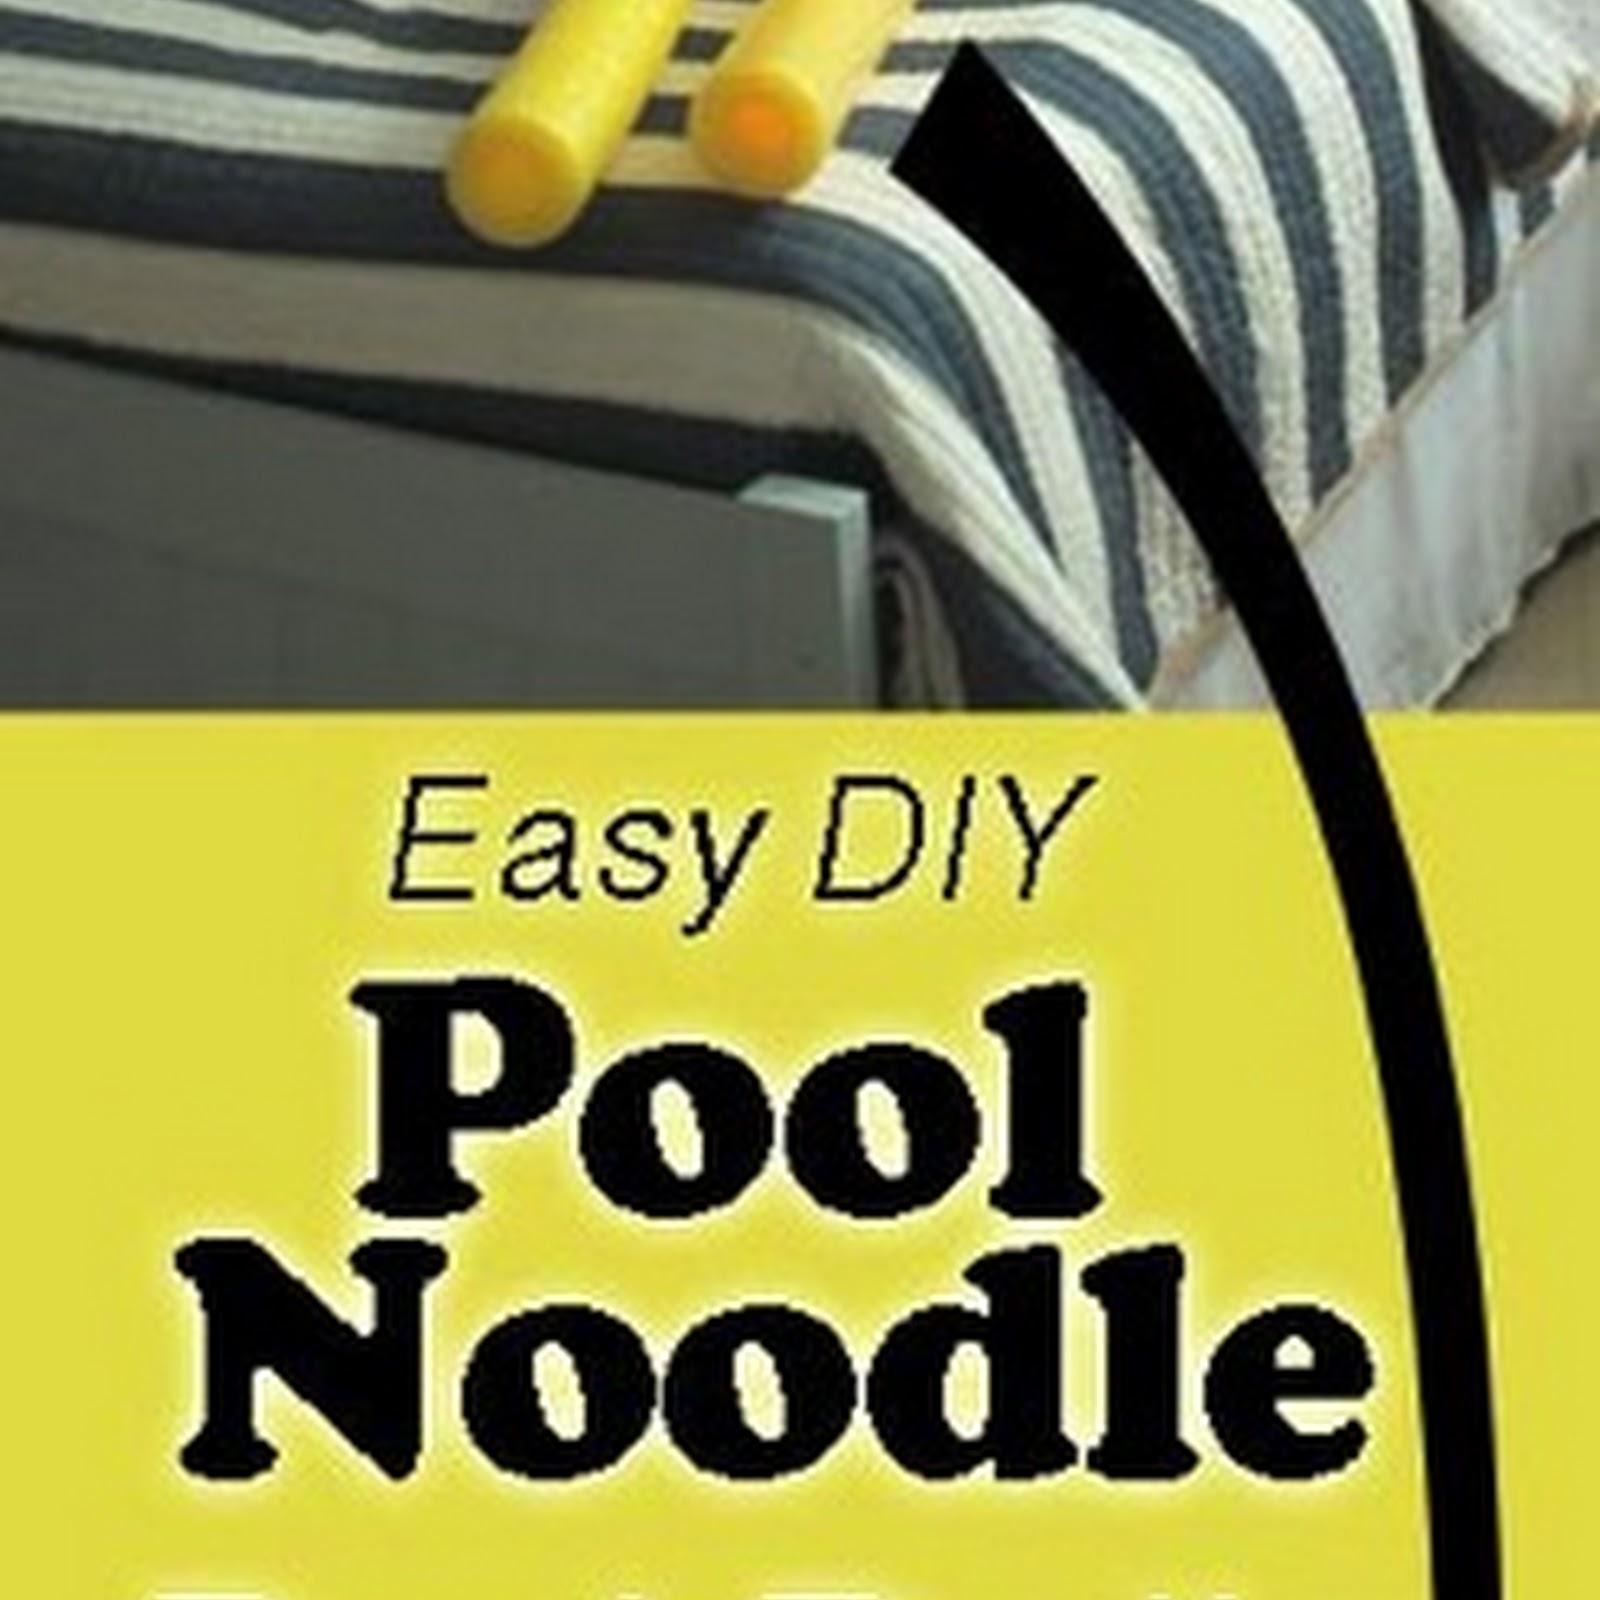 DIY Toddler Bed Rails from Pool Noodles